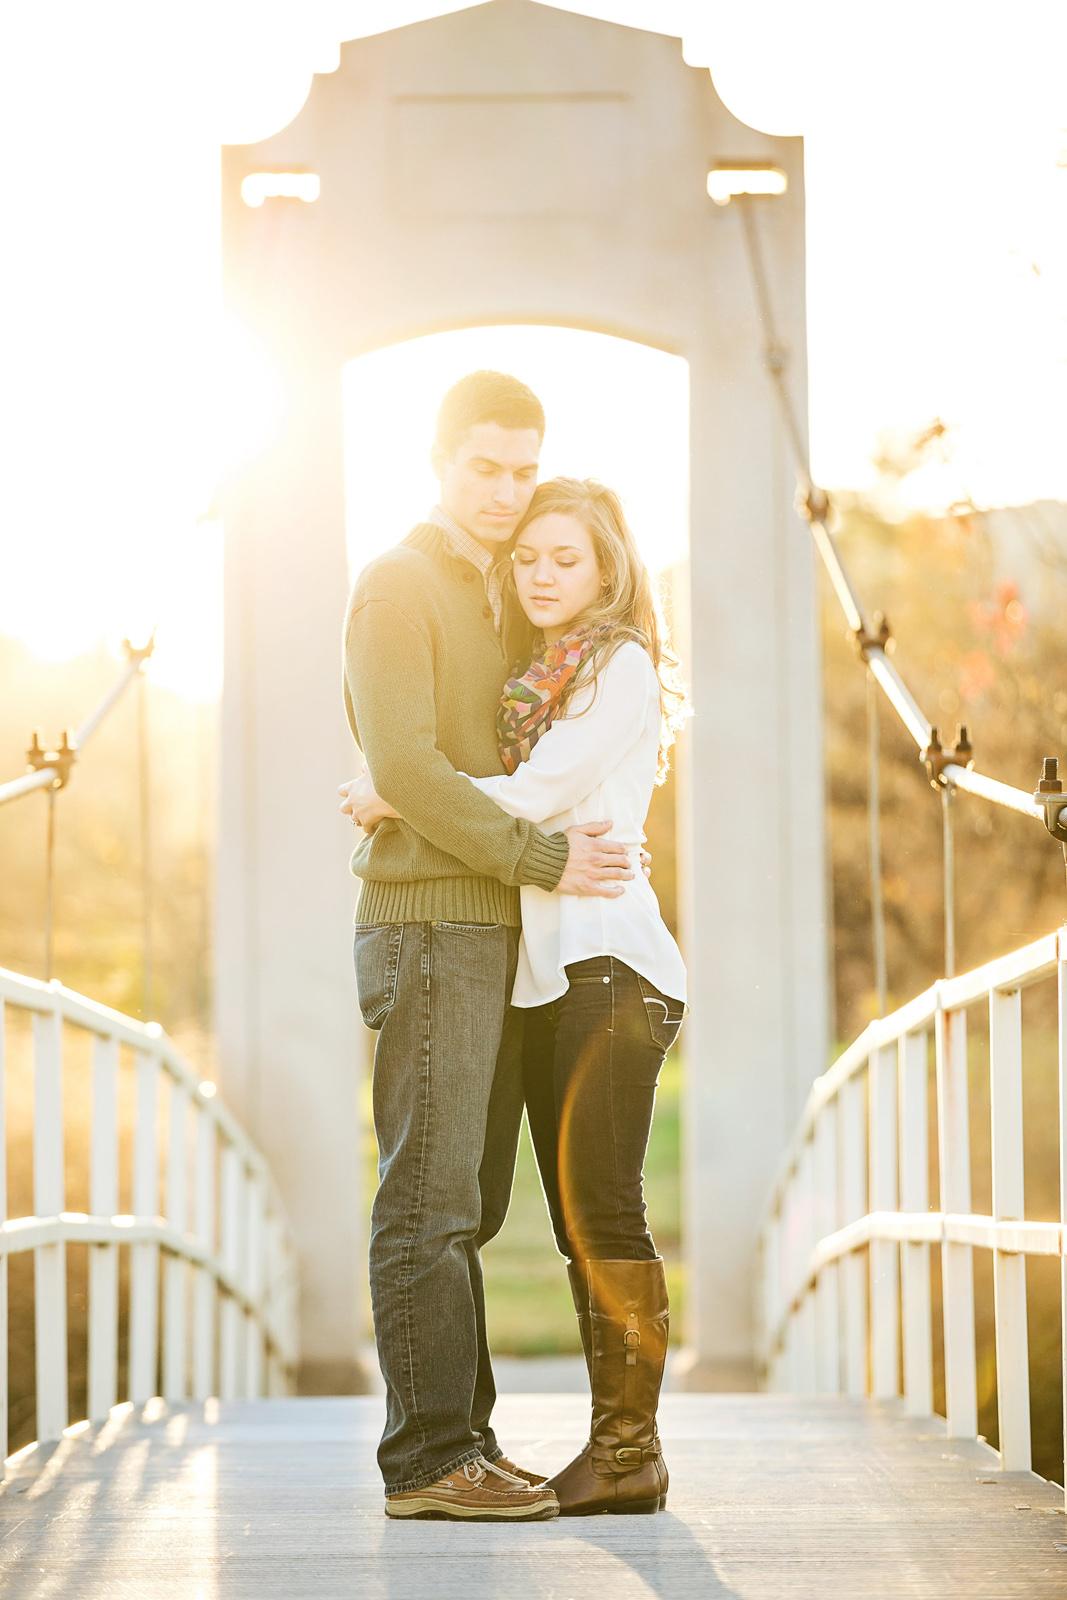 Oldani Photography-St Louis-Forest Park-Grand Basin-Engagement Session-engagement photos_20141108_171355-2.jpg